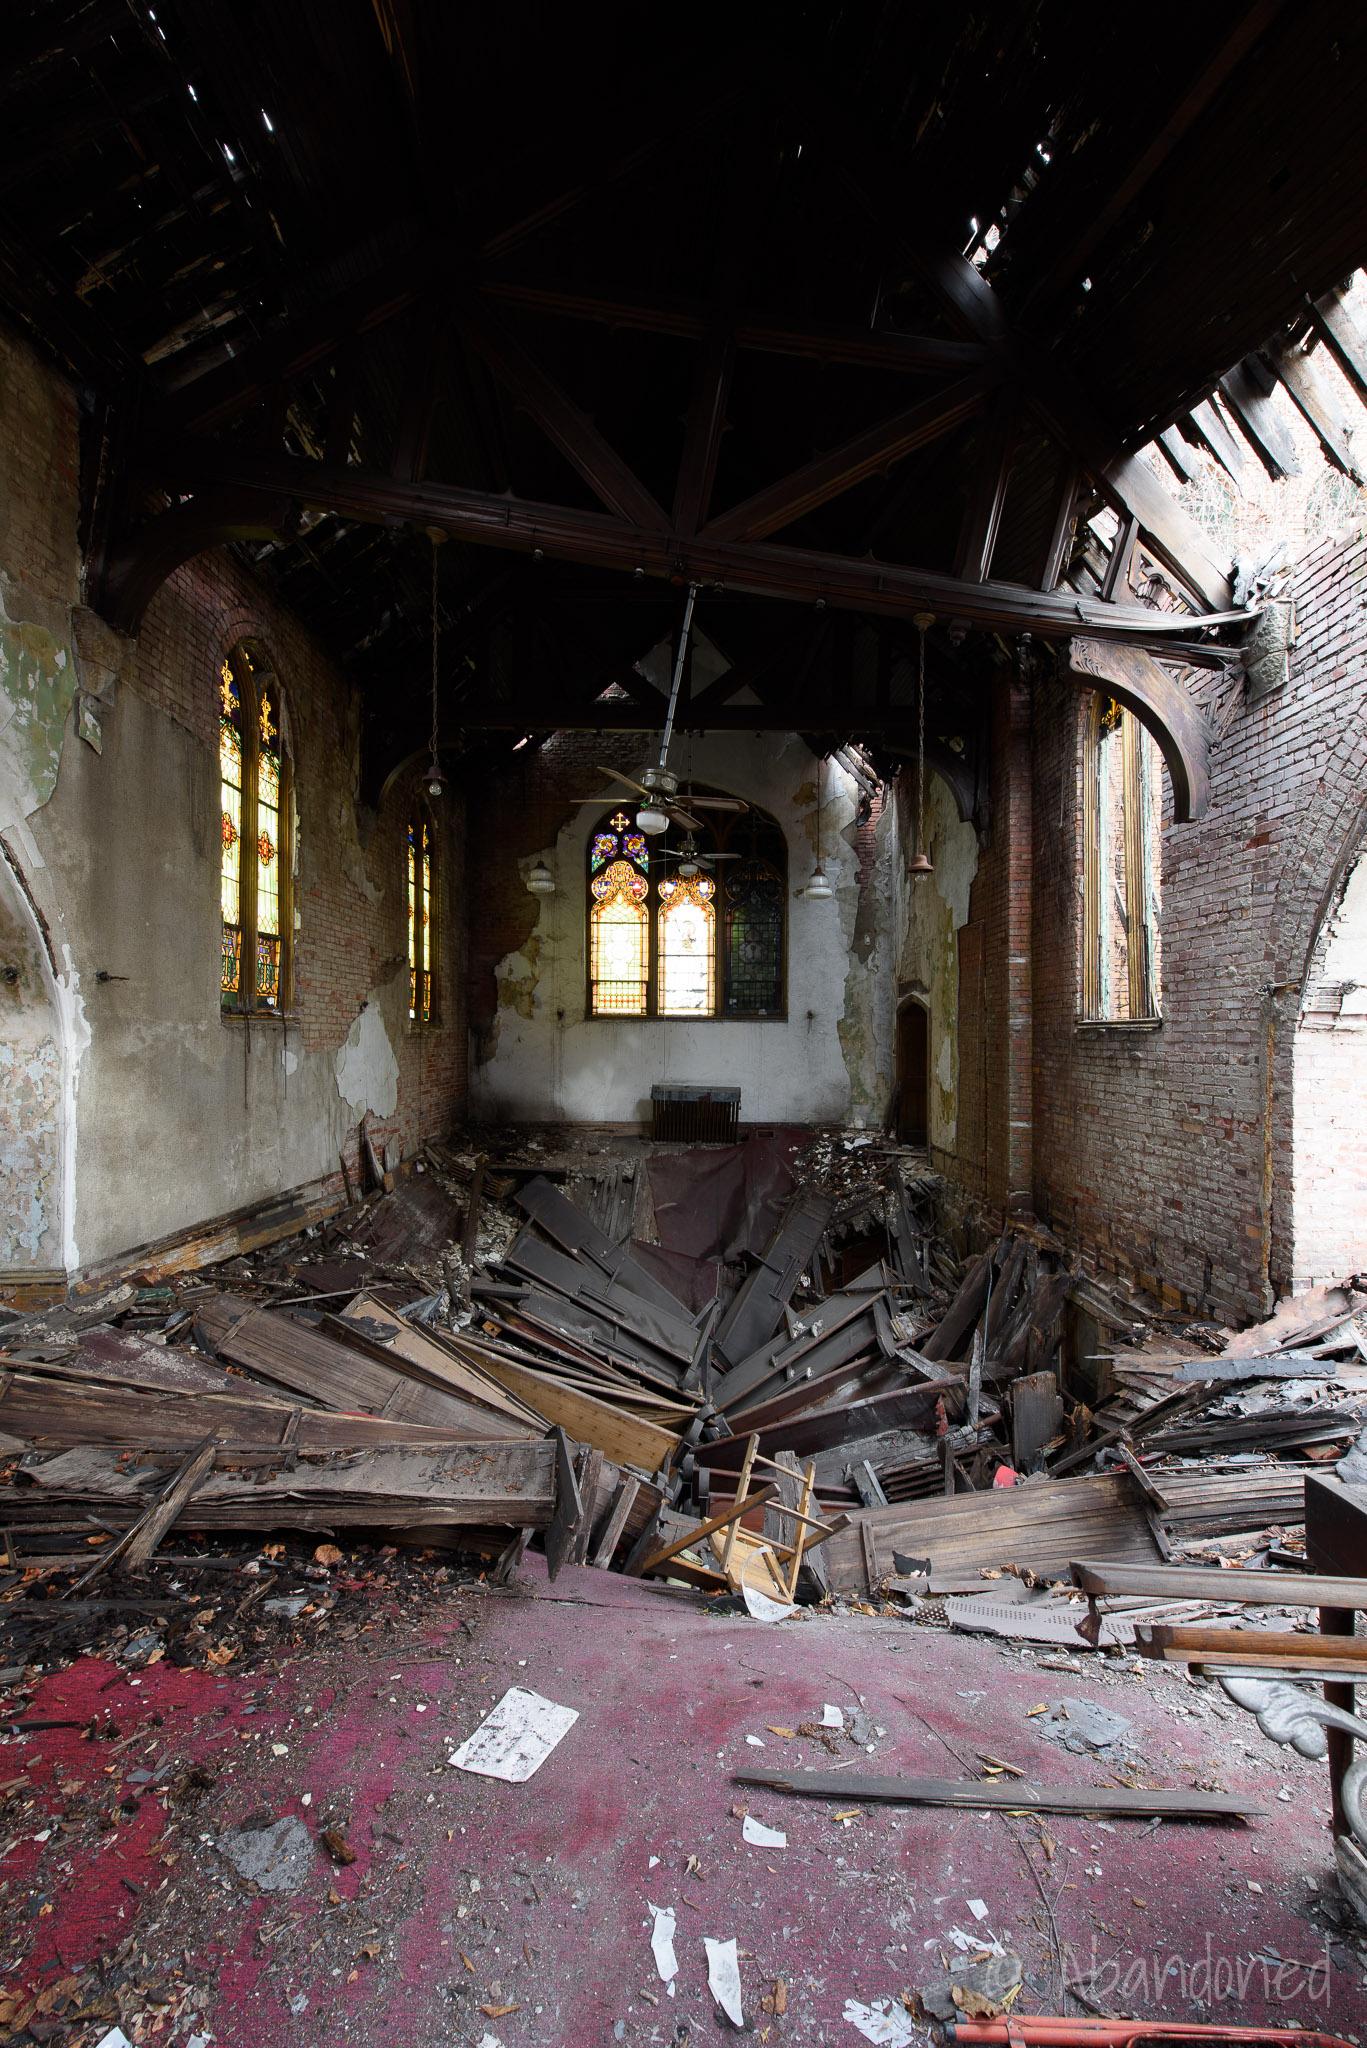 St. Mary's Episcopal Church